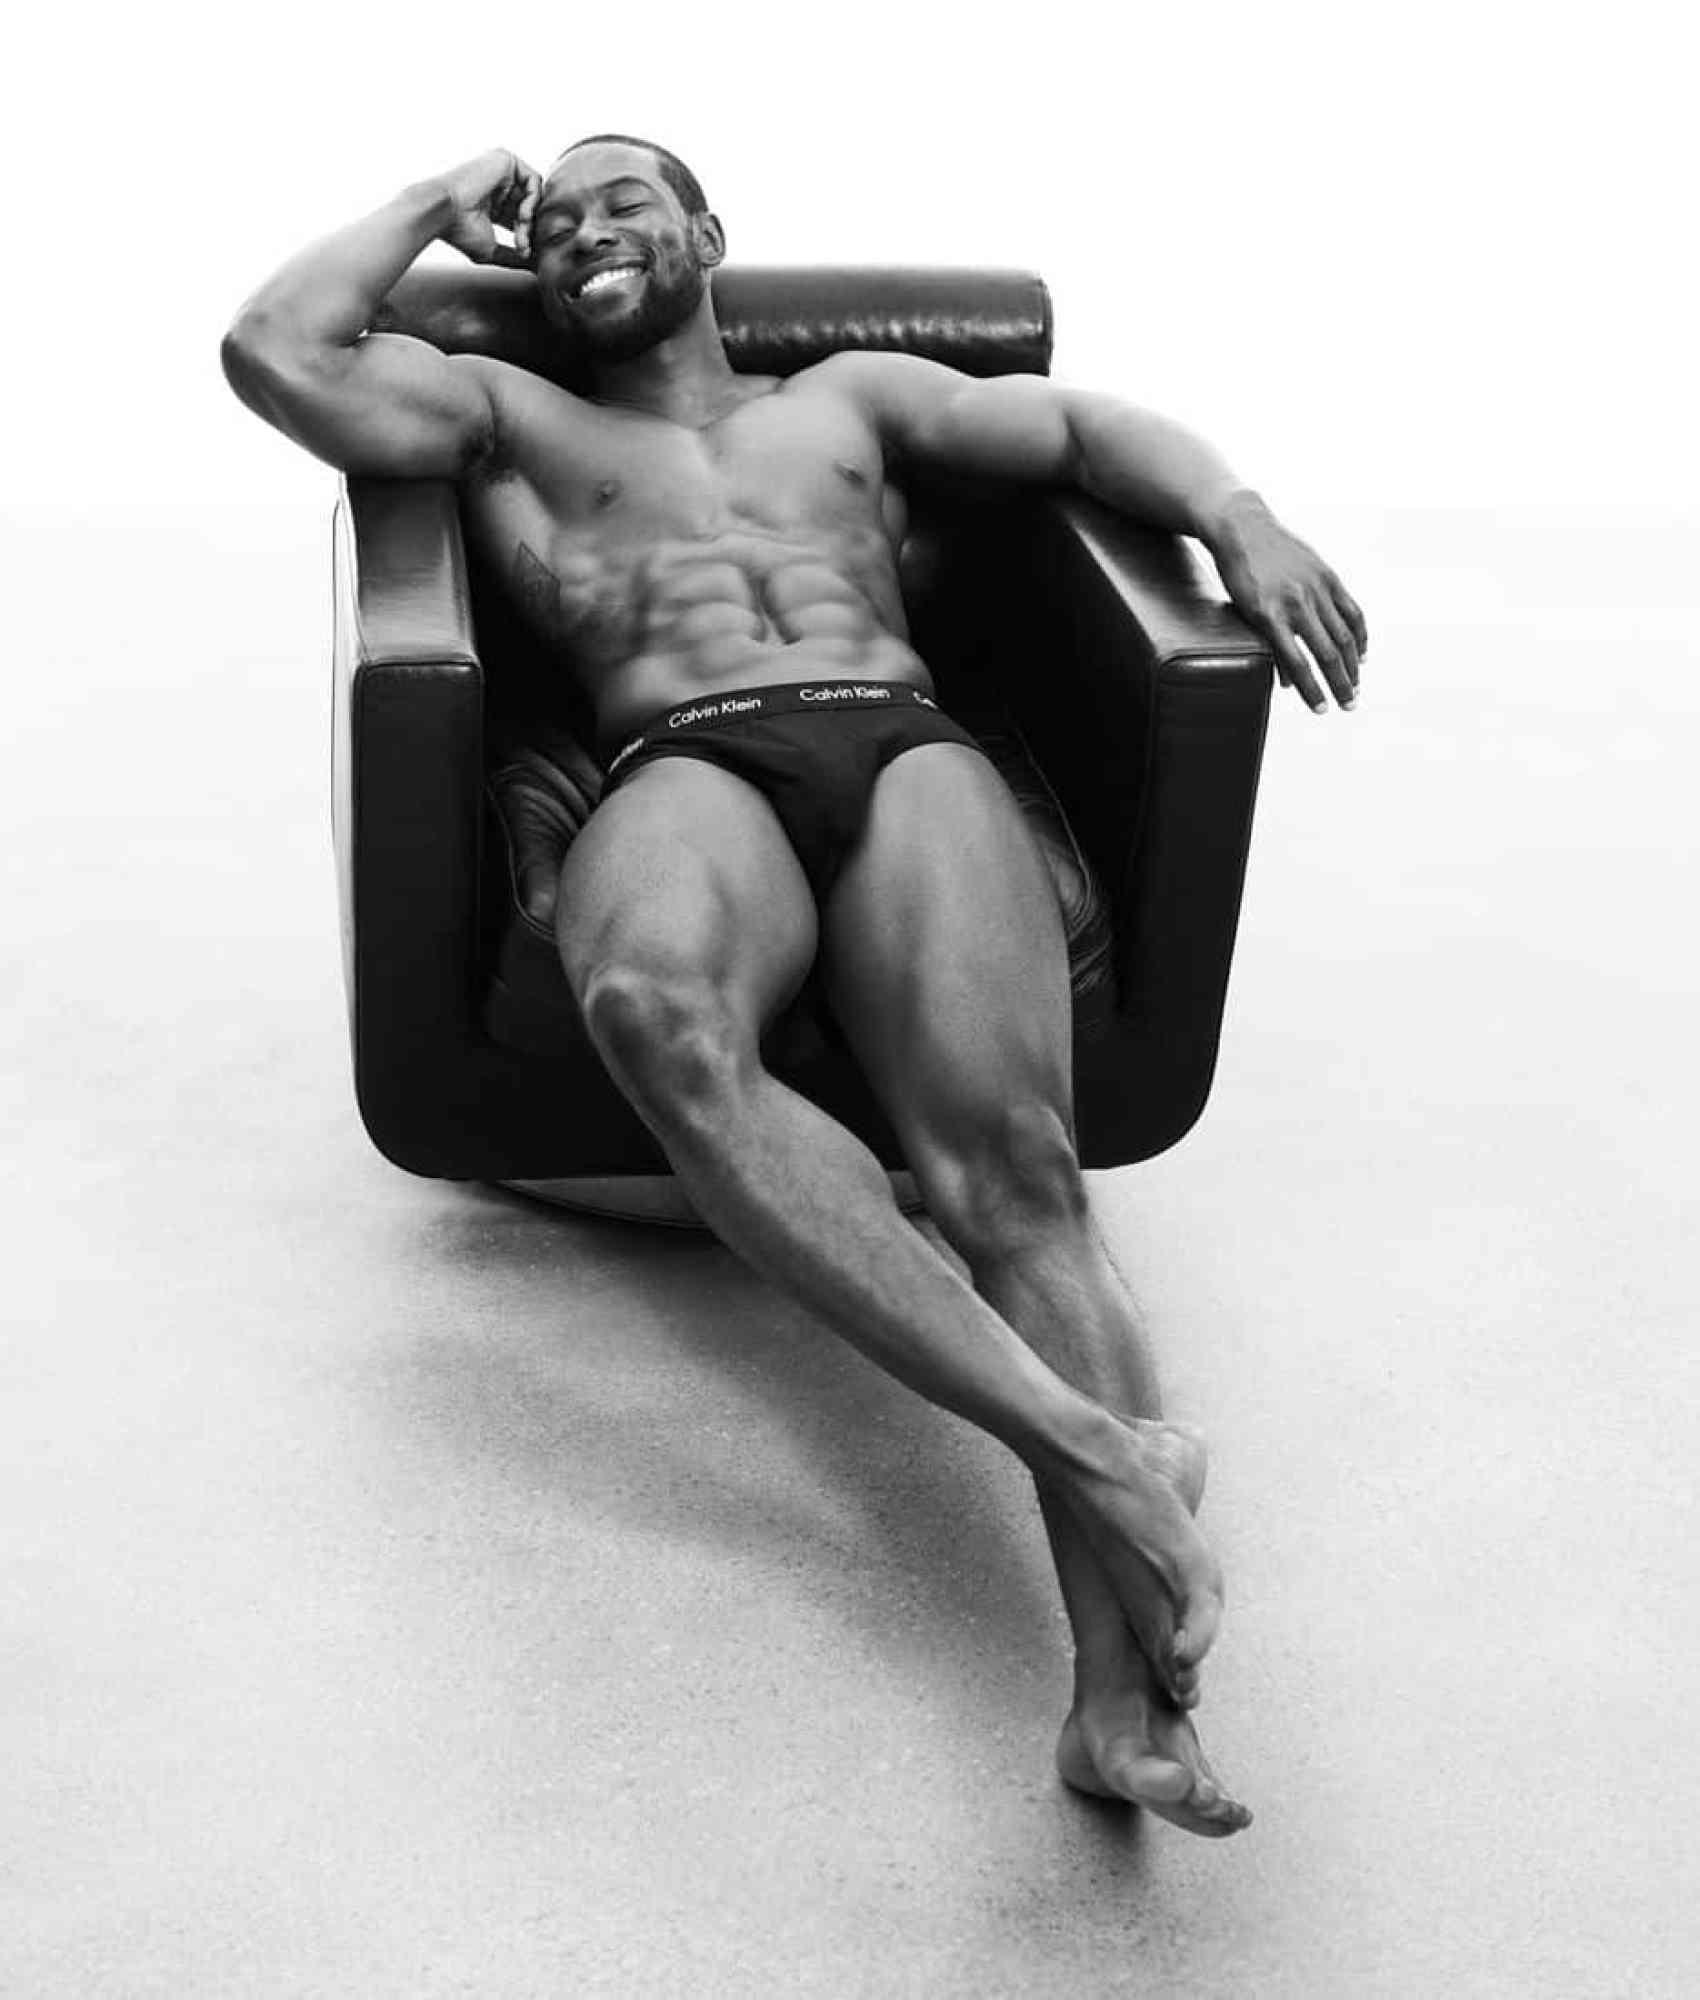 3a398db528 16903249 10154281213376016 4447627987599310194 o (1). The Calvin Klein  Spring  17 men s underwear campaign stars the cast ...